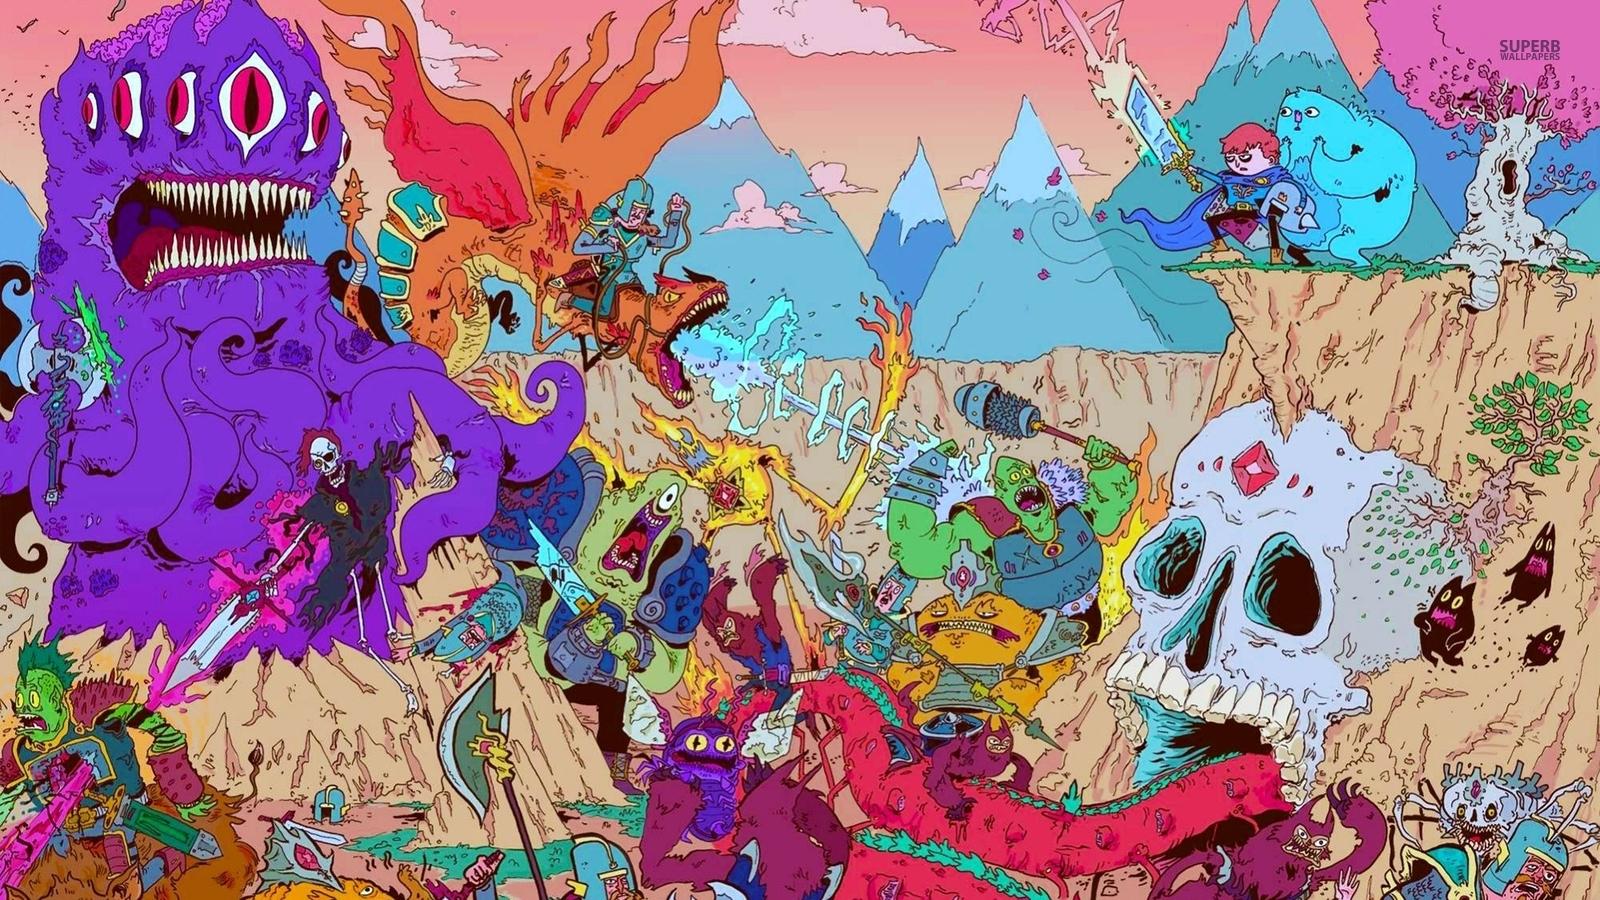 Adventure Time - Hd Wallpaper Adventure Time - HD Wallpaper